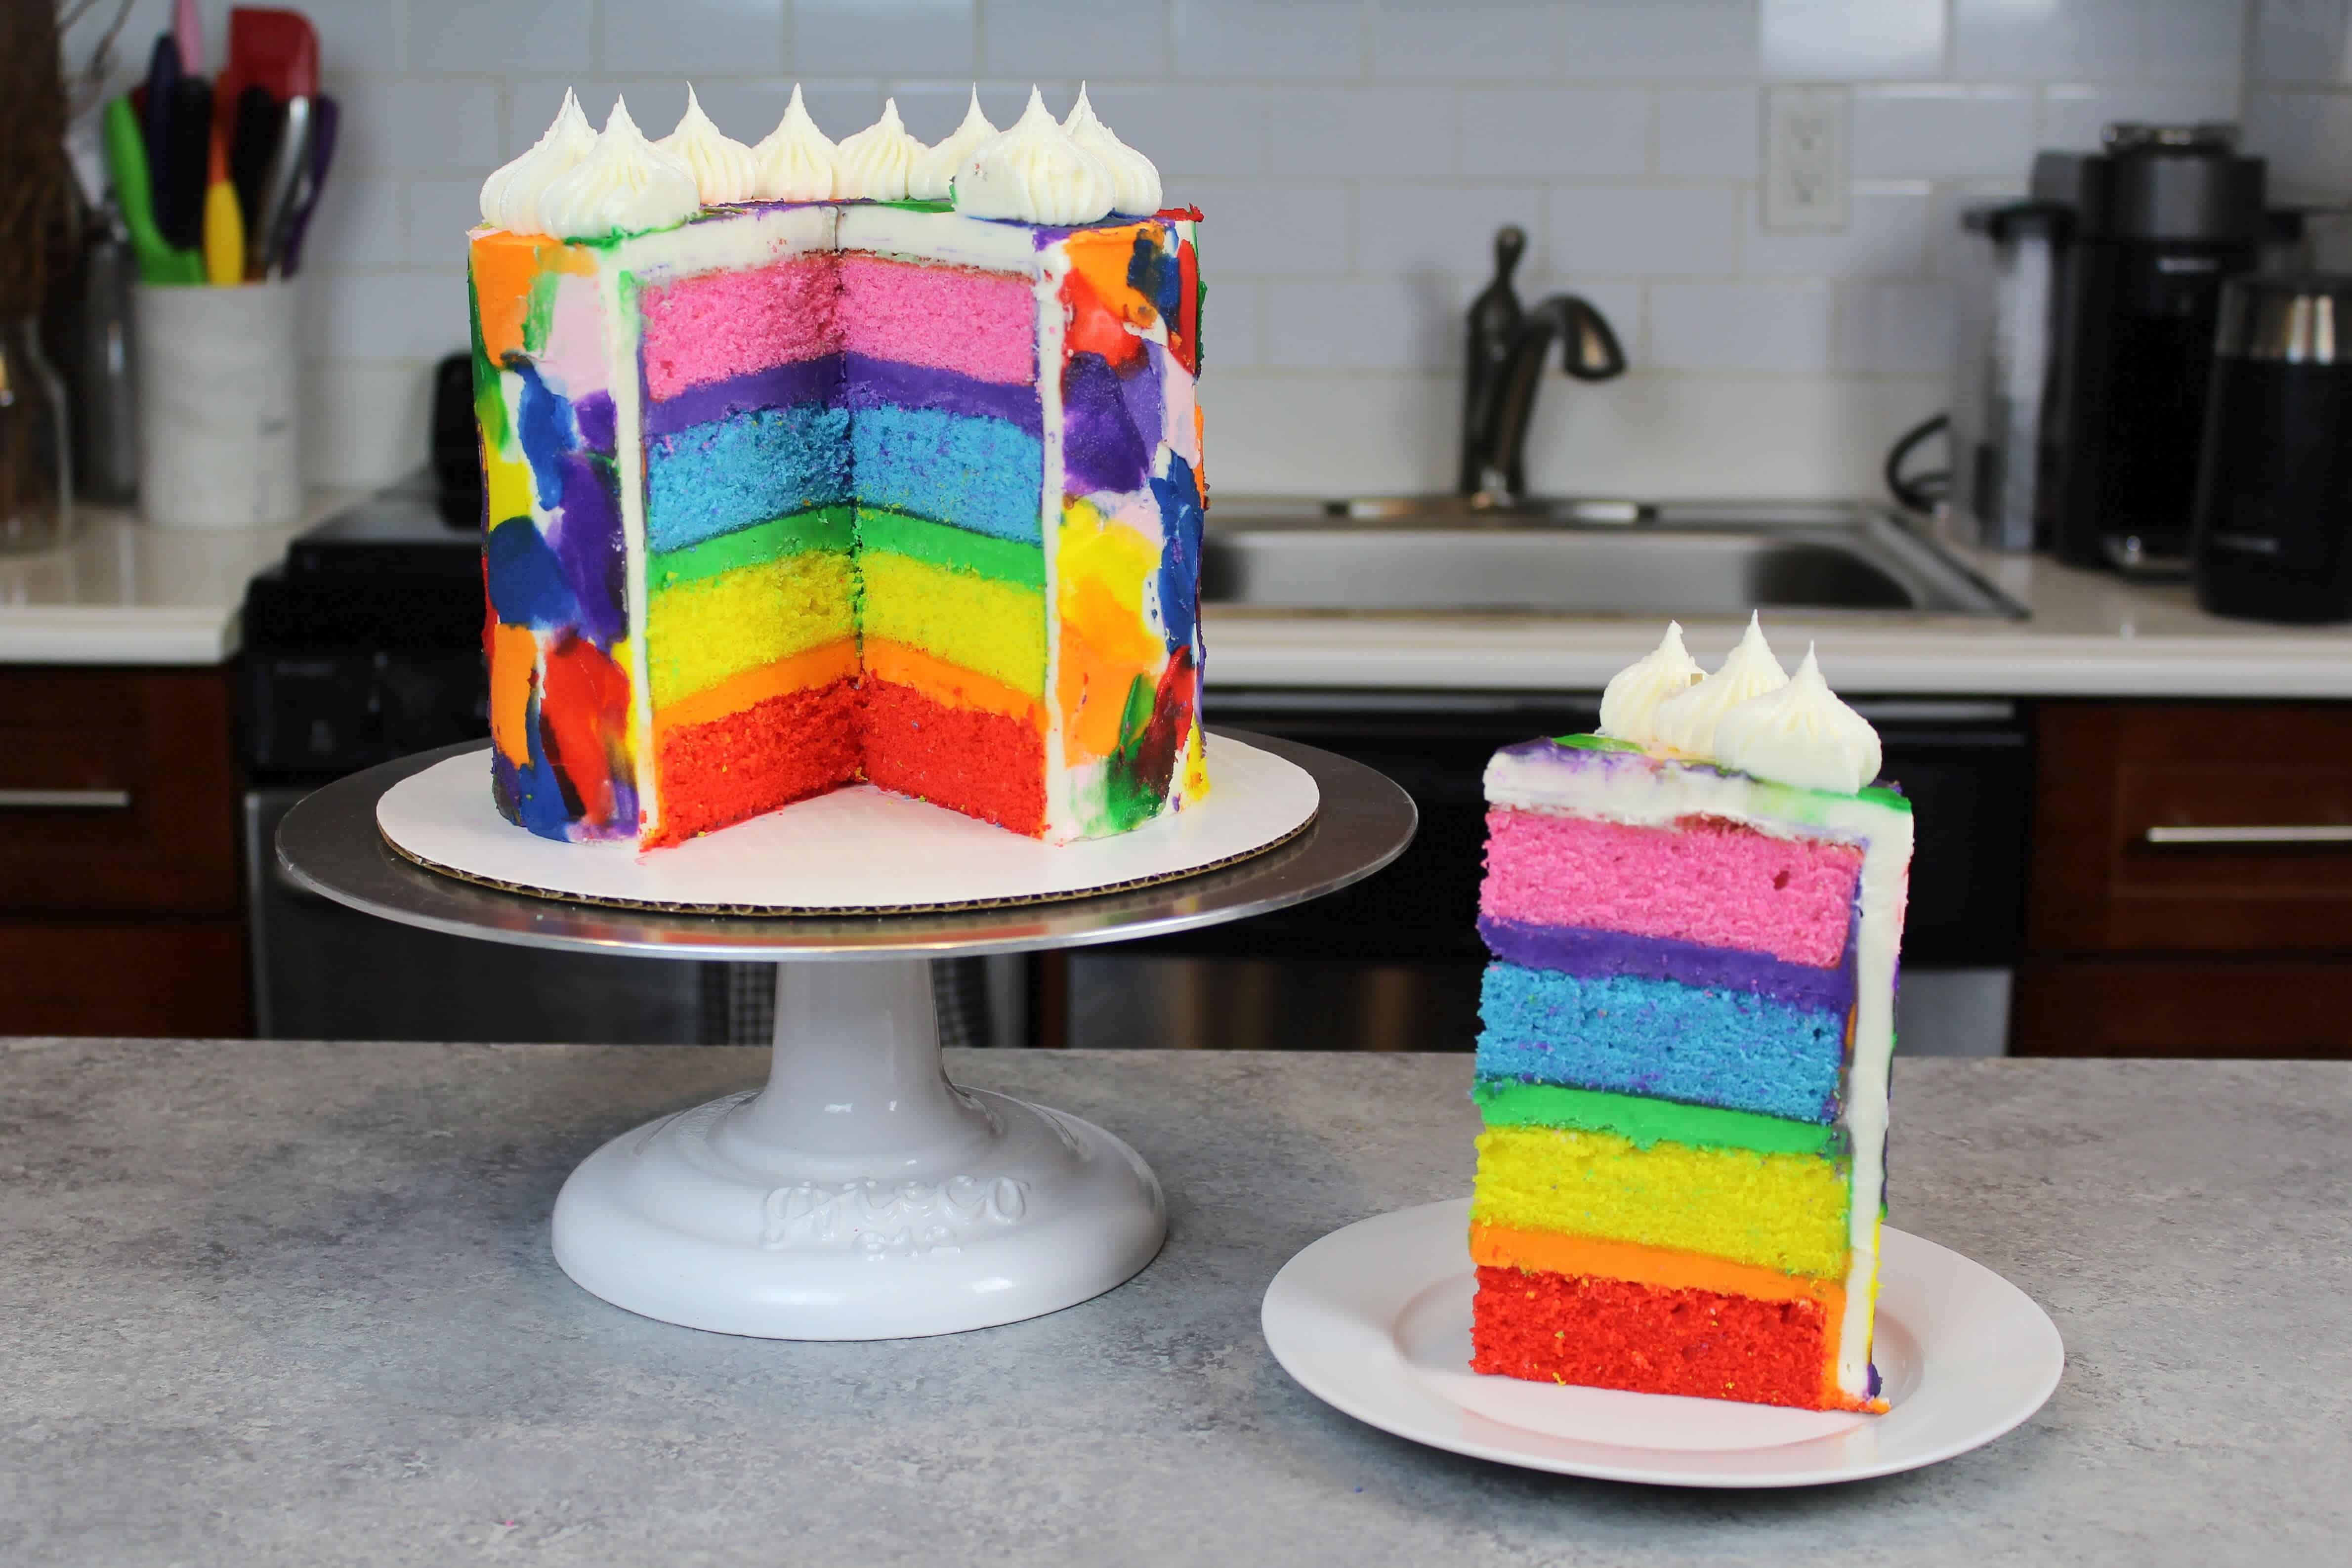 rainbow layer cake recipe, made with 4 cake layers